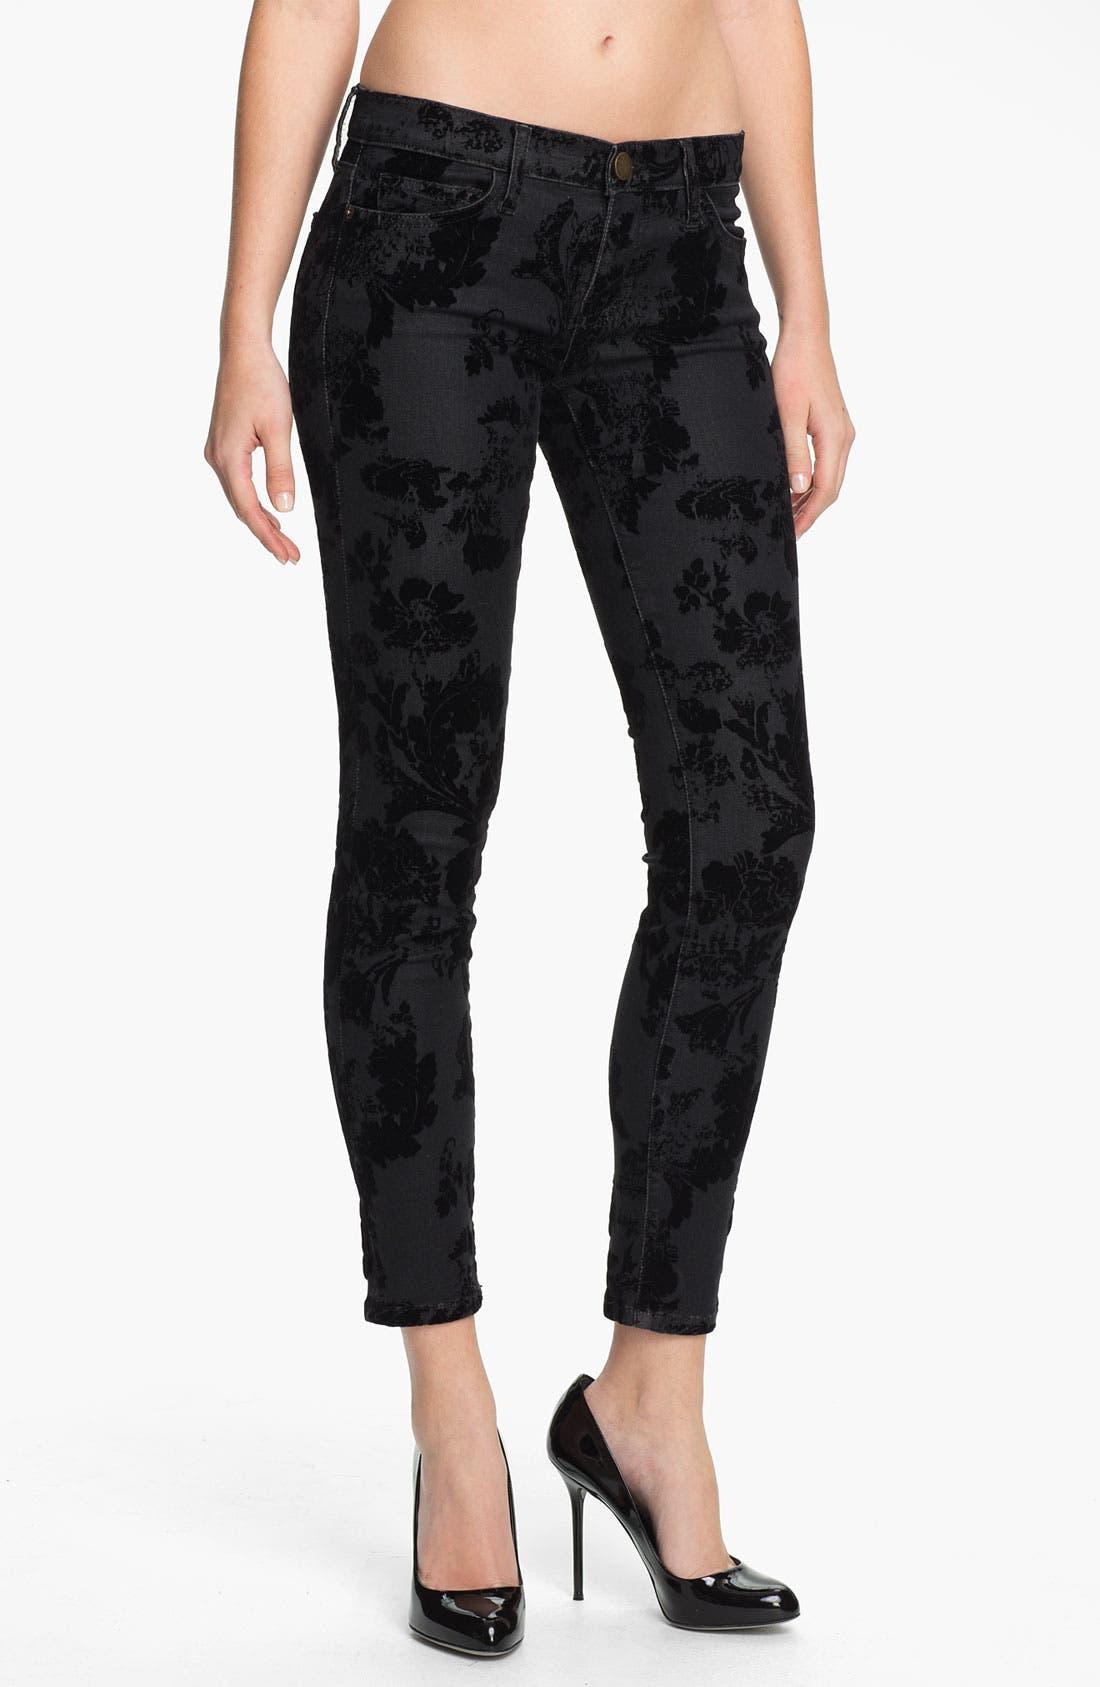 Main Image - Current/Elliott Ankle Zip Skinny Jeans (Black Velvet Floral)